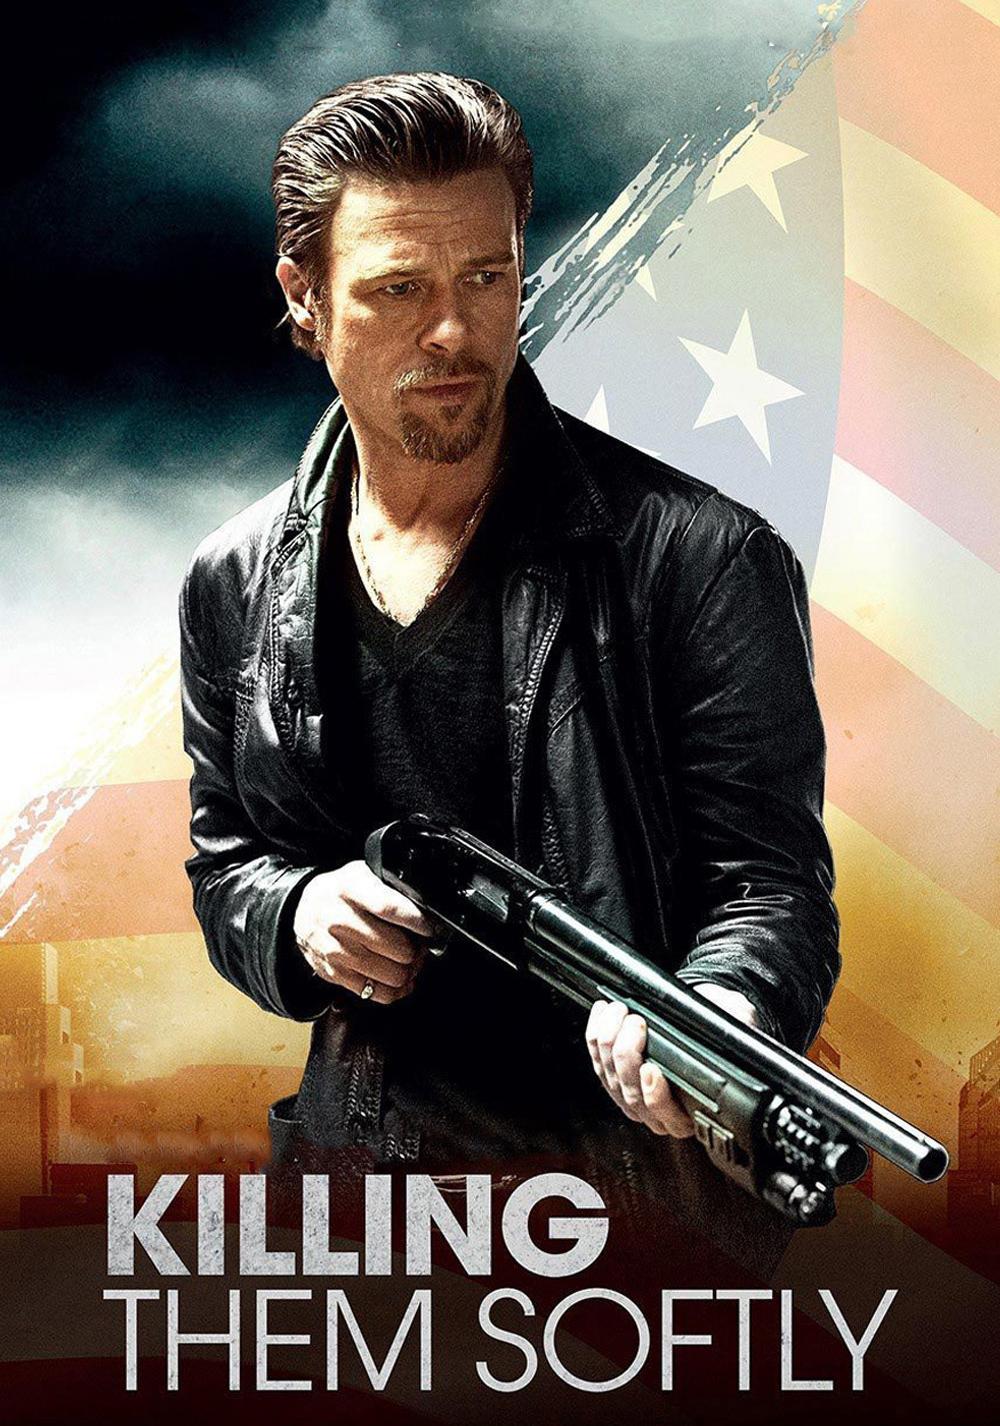 killing-them-softly-54d6455360699.jpg